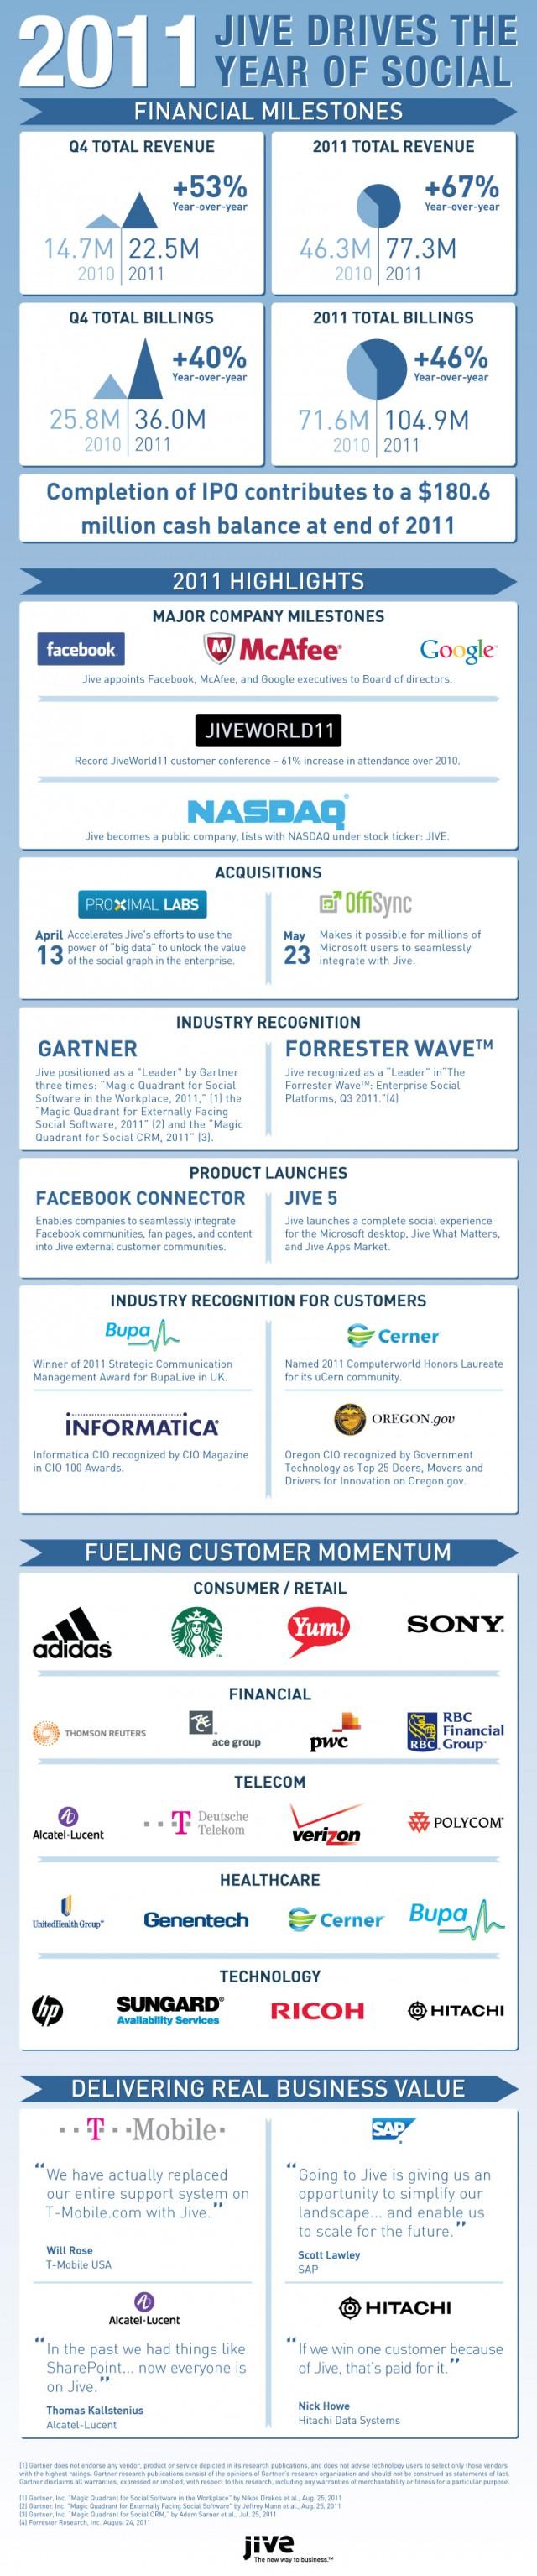 Jive 2011 Highlights Infographic